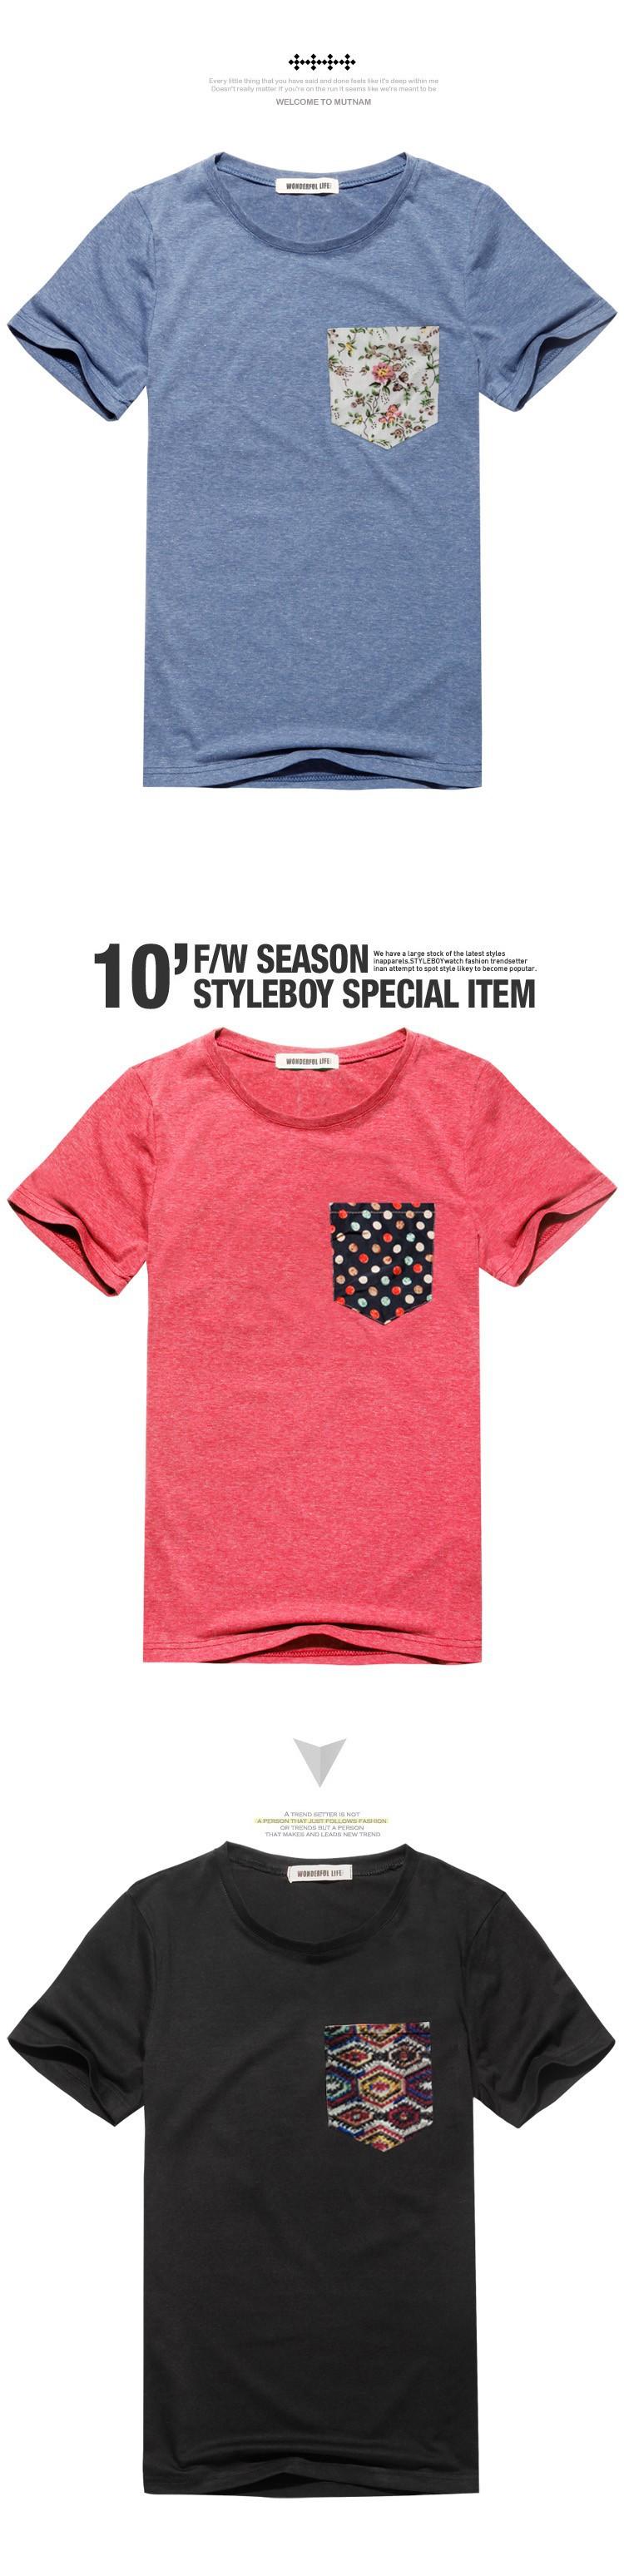 Мужская футболка GYTX & Desigual Slim Fit Camisetas GYTX0028